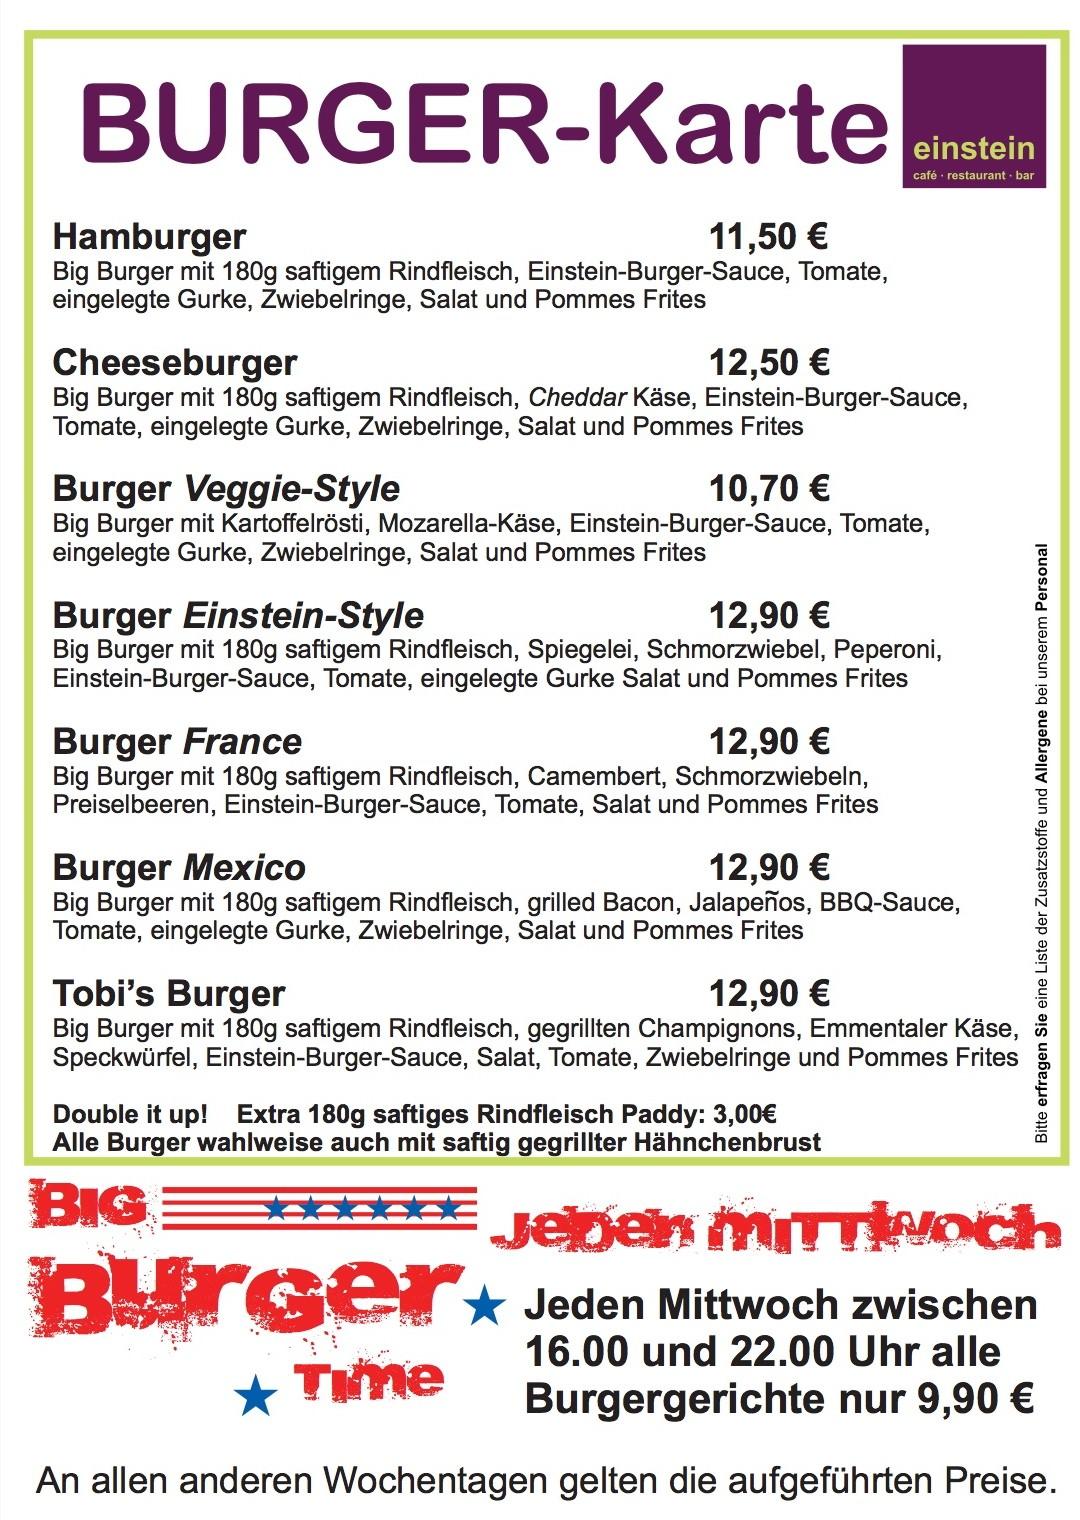 BurgerTime_2017.jpg